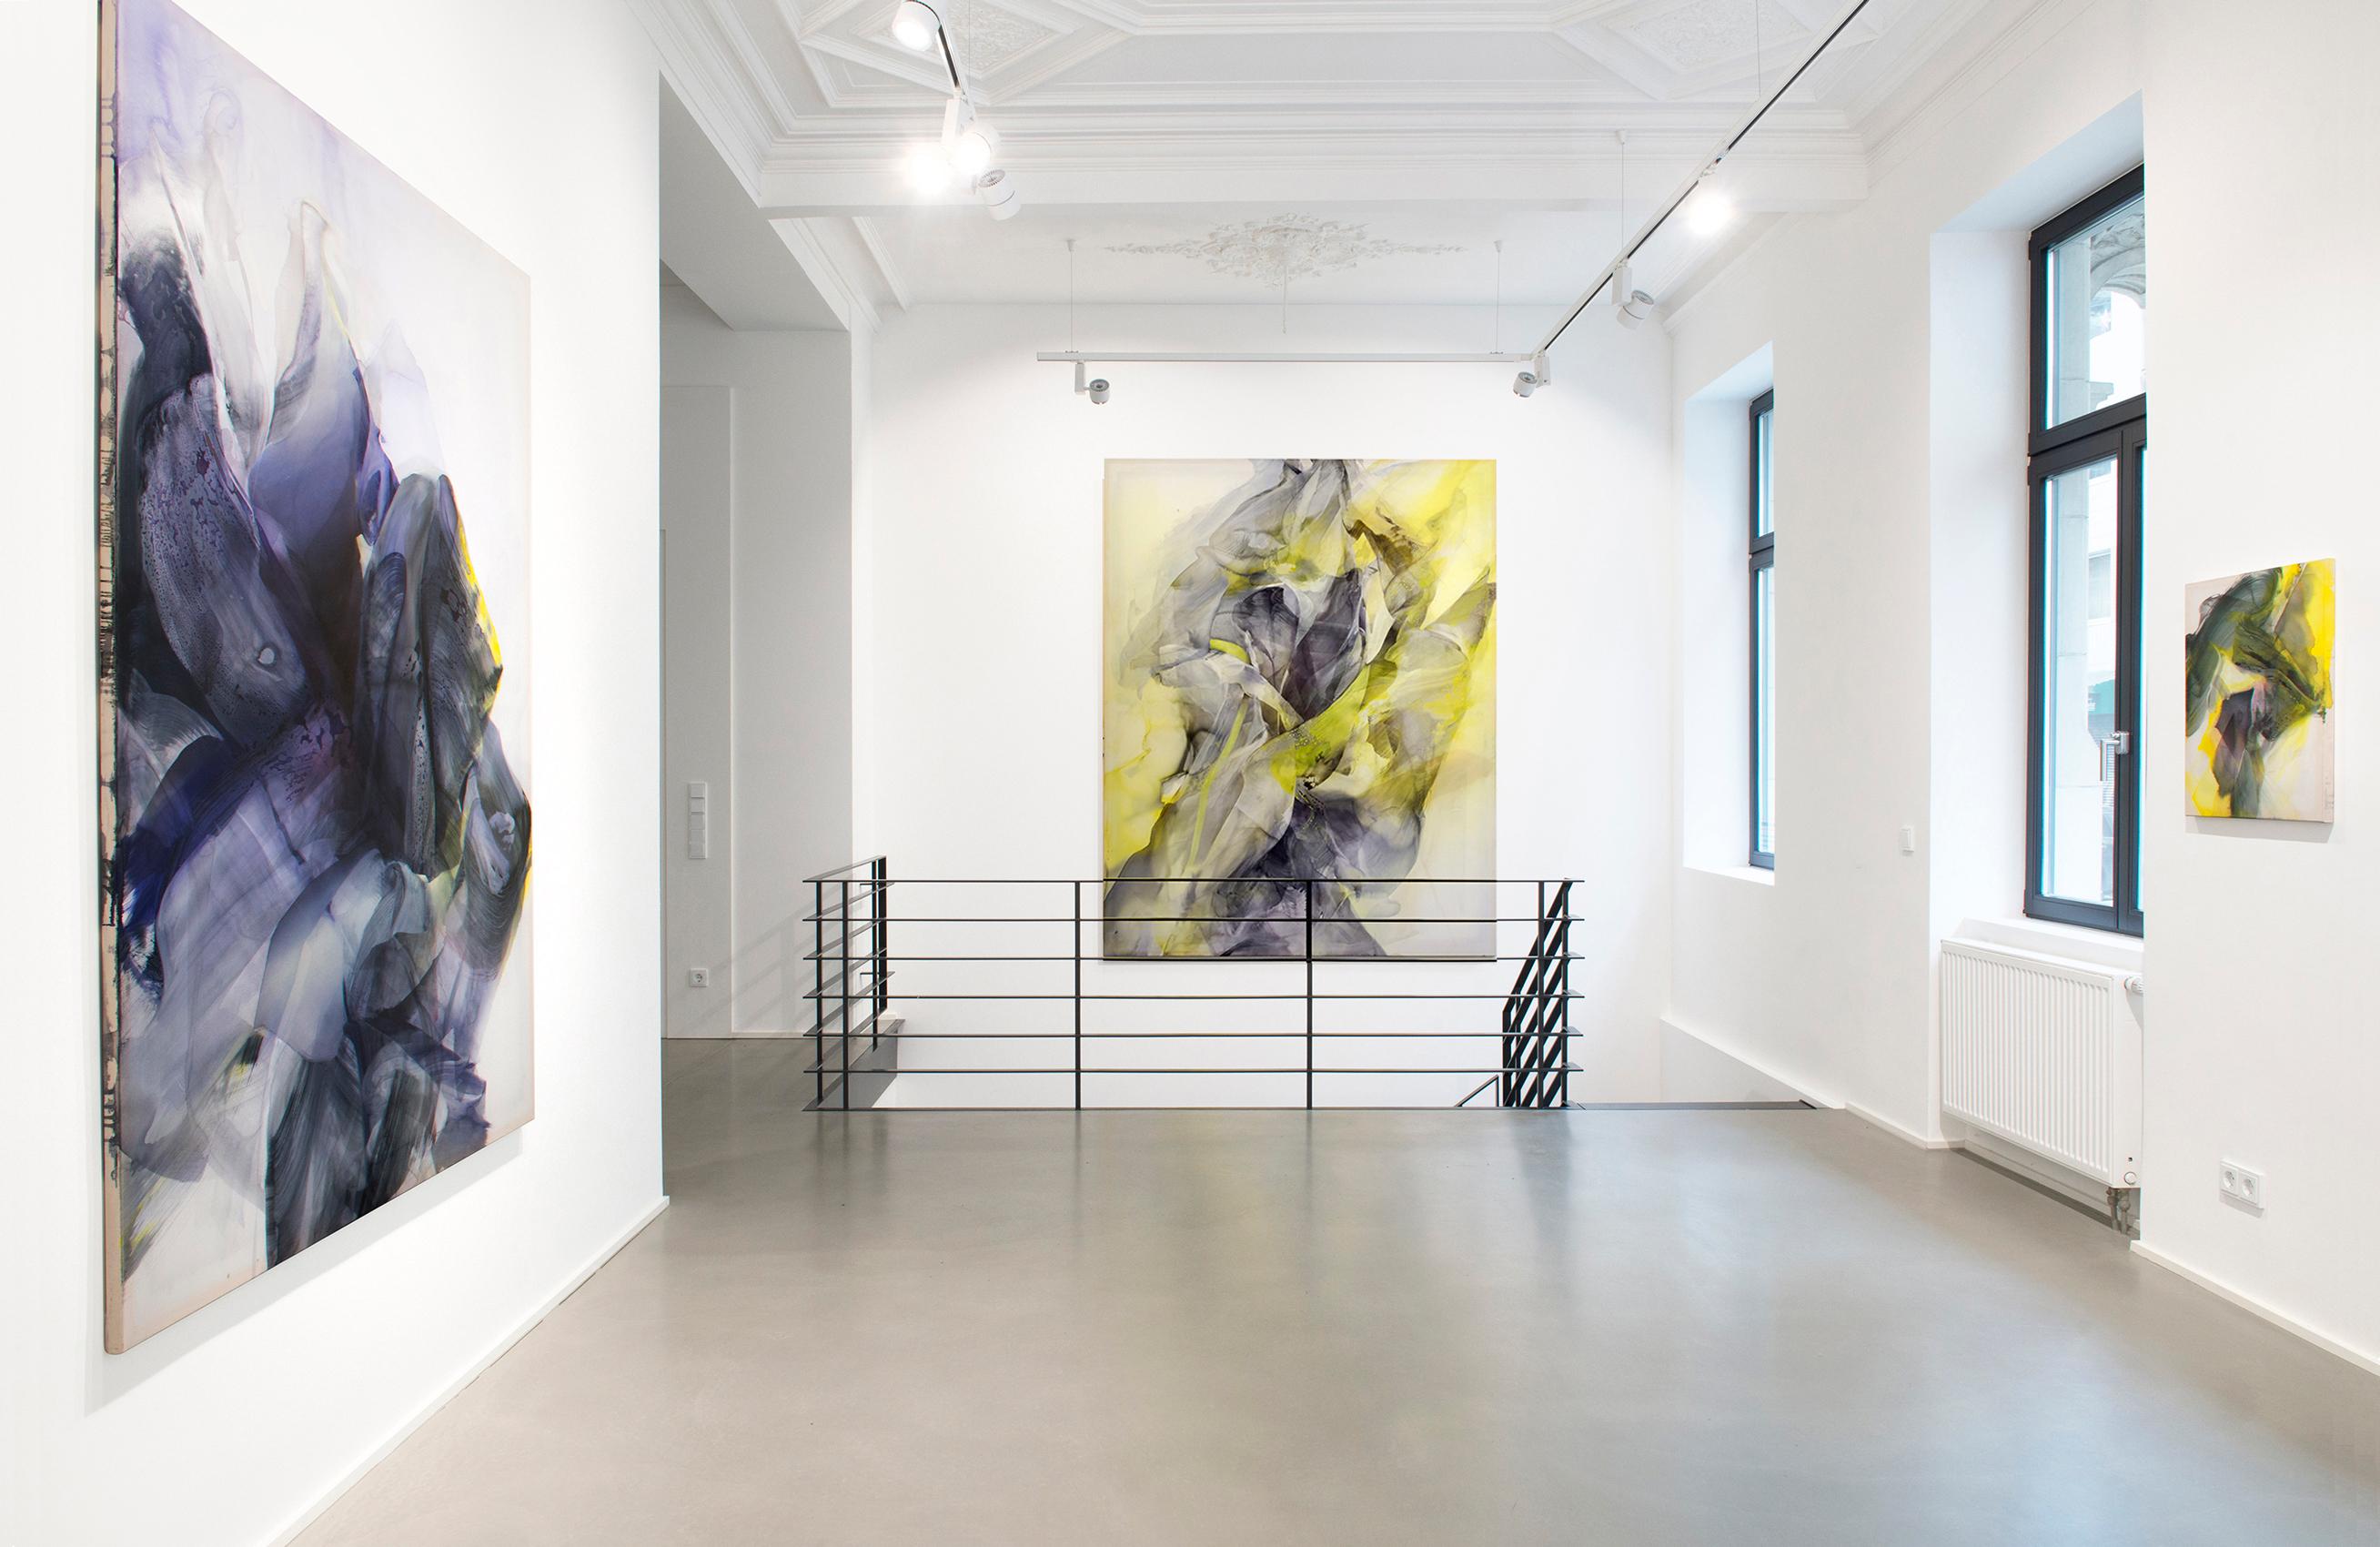 © Natascha Schmitten, Installation view PHOSPHOR, Galerie Christian Lethert, 2018_1